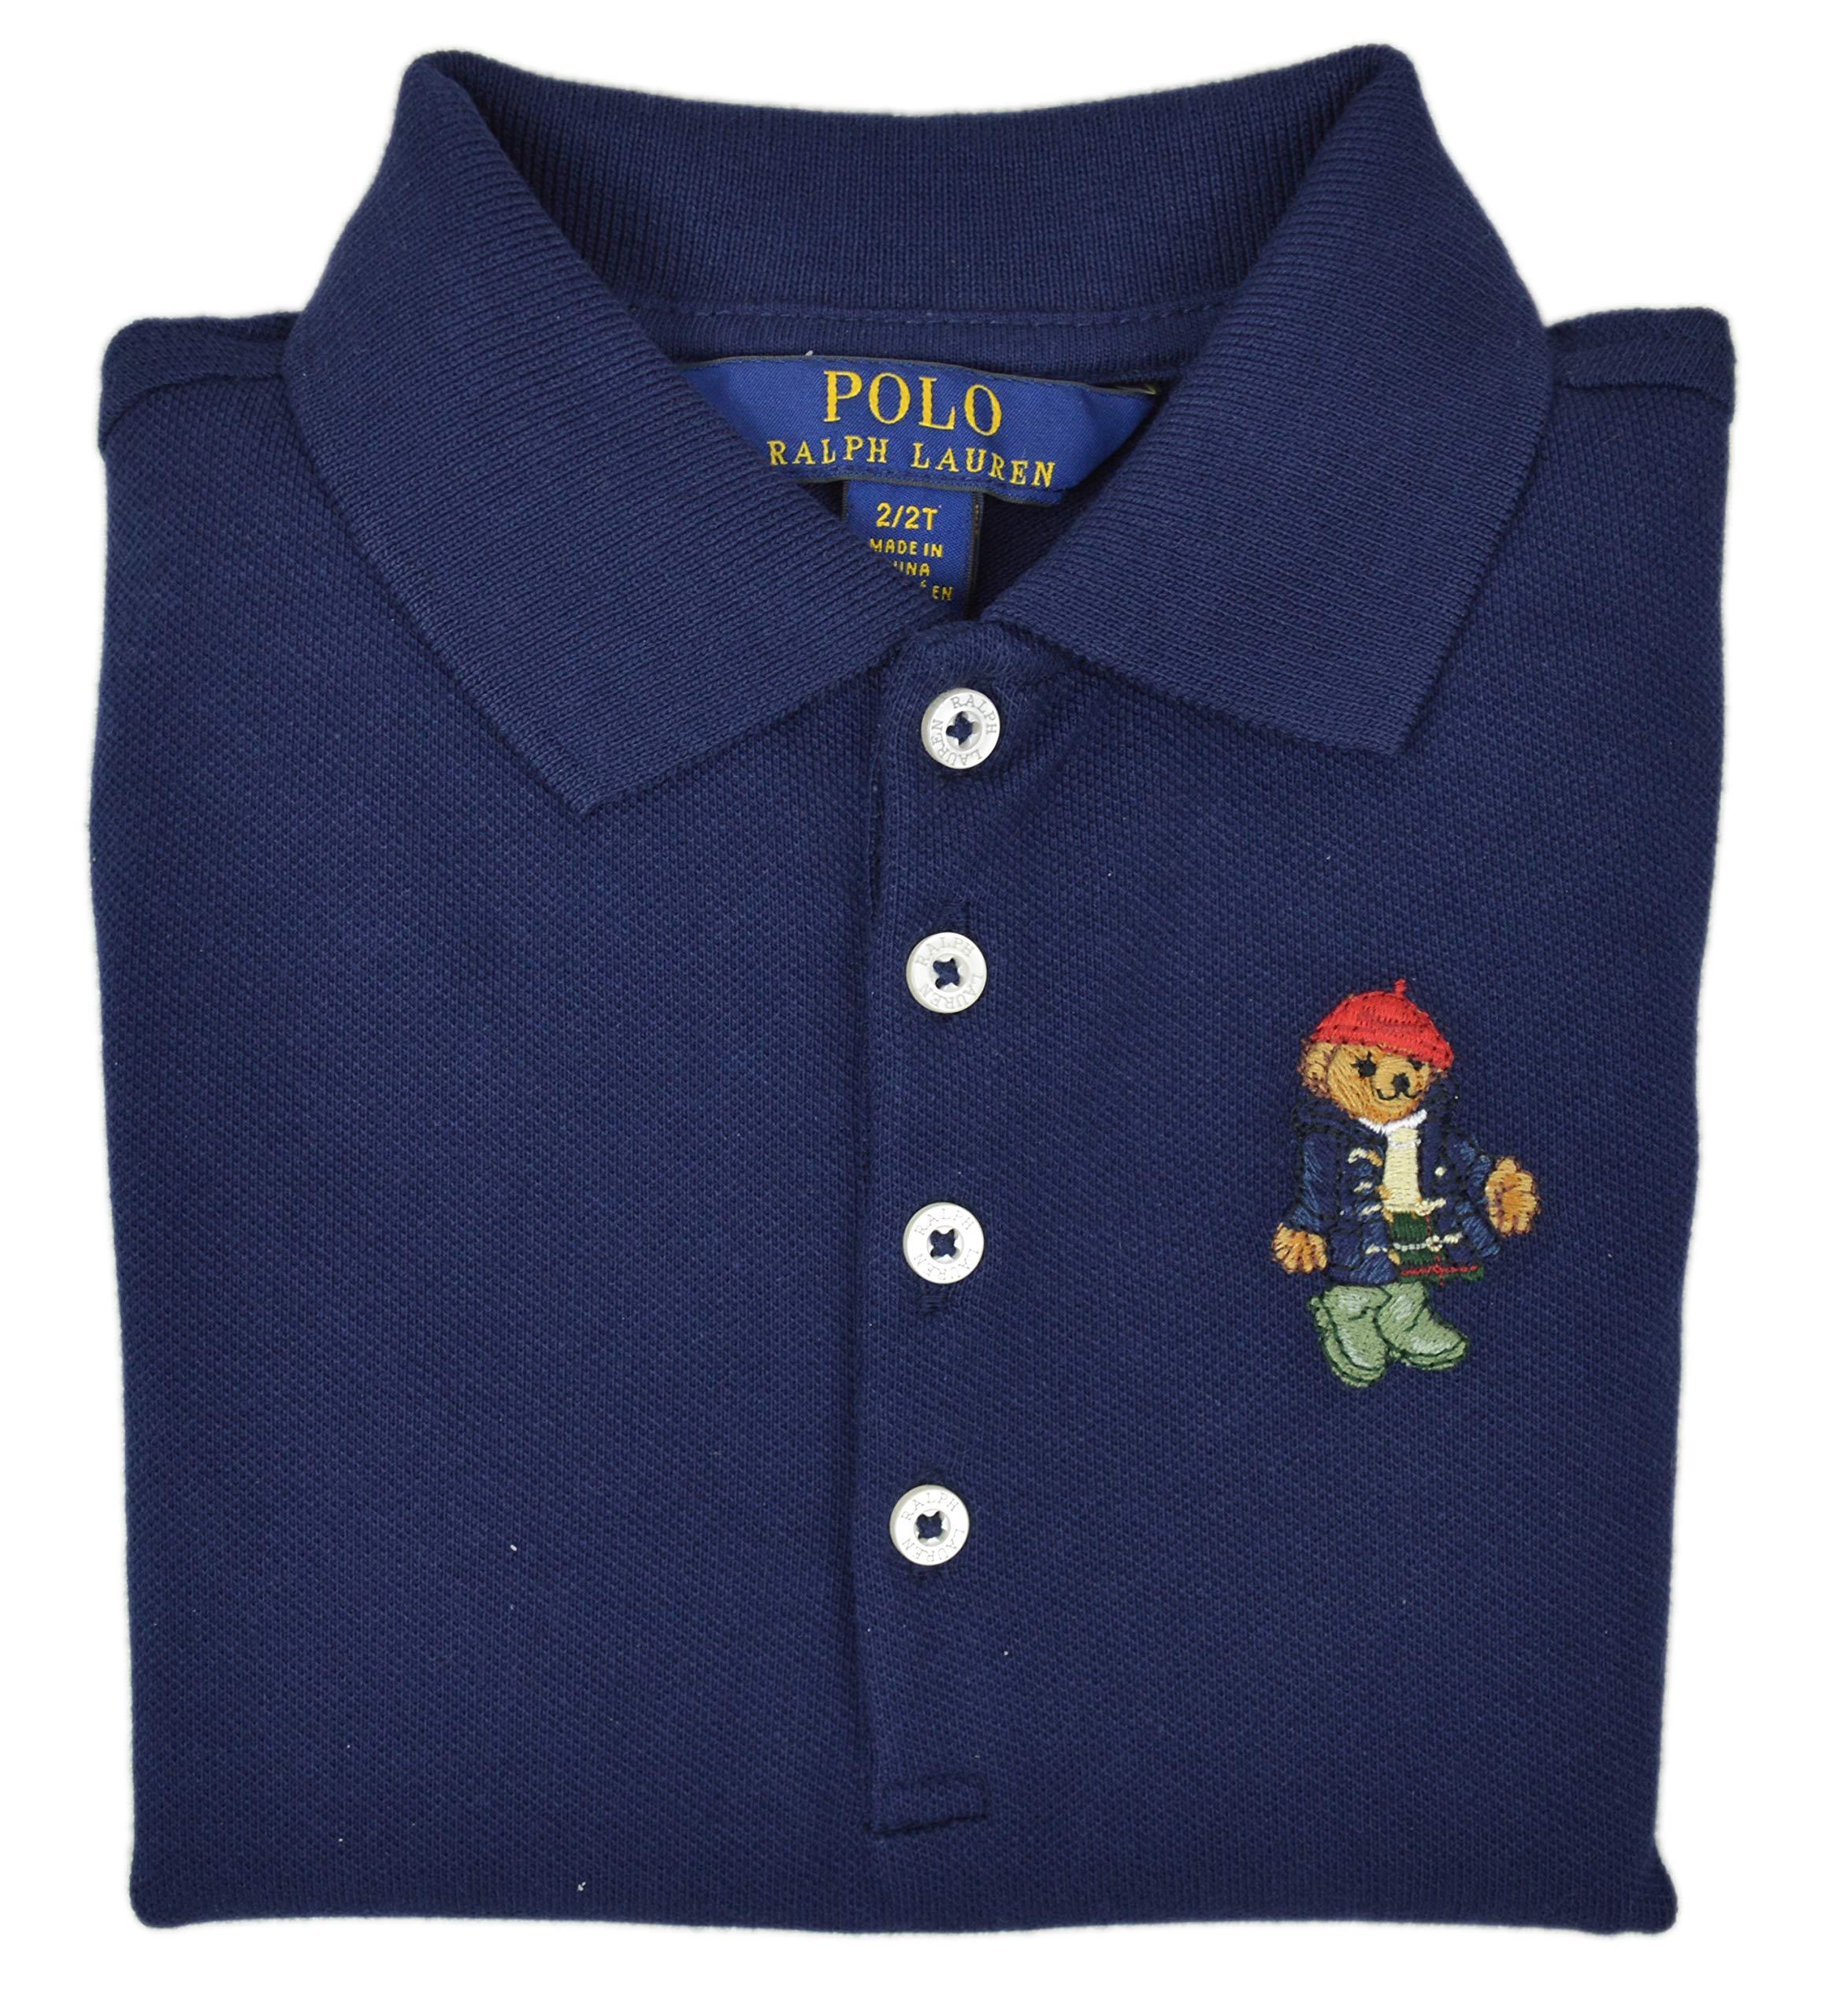 Polo Ralph Lauren Girl's Mesh Bear Logo Polo Shirt Short Sleeves, Navy (2/2T) (2/2T) by Polo Ralph Lauren (Image #2)